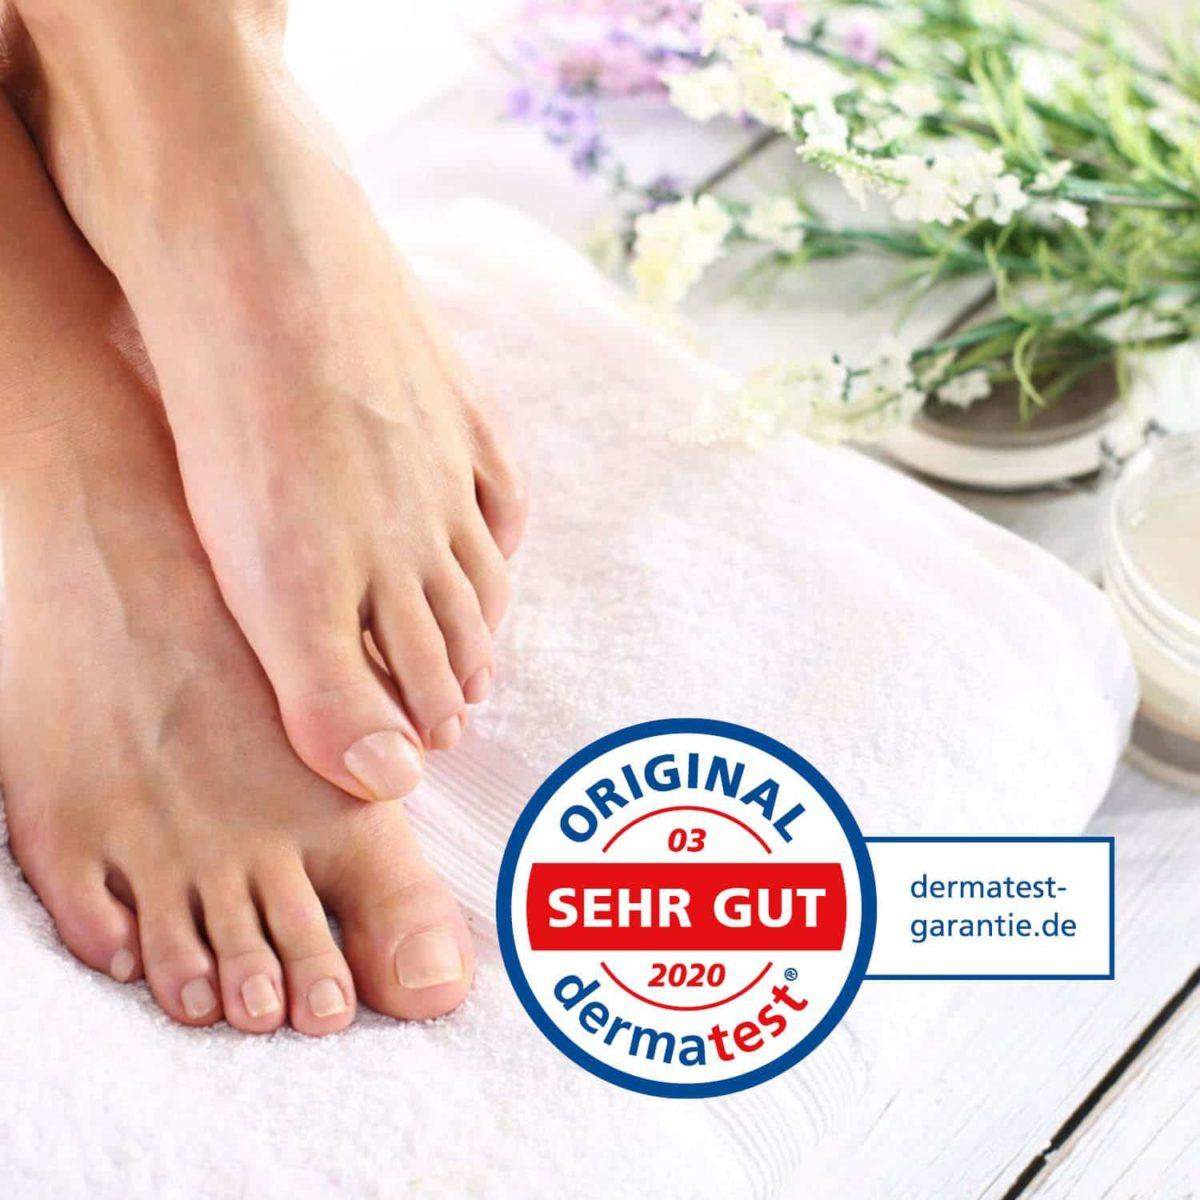 Casida Set 5 +1 Nagelöl Repair & Protect 10 ml PZN 10022445 Apotheke Nagelpilz Füße Hände (8)